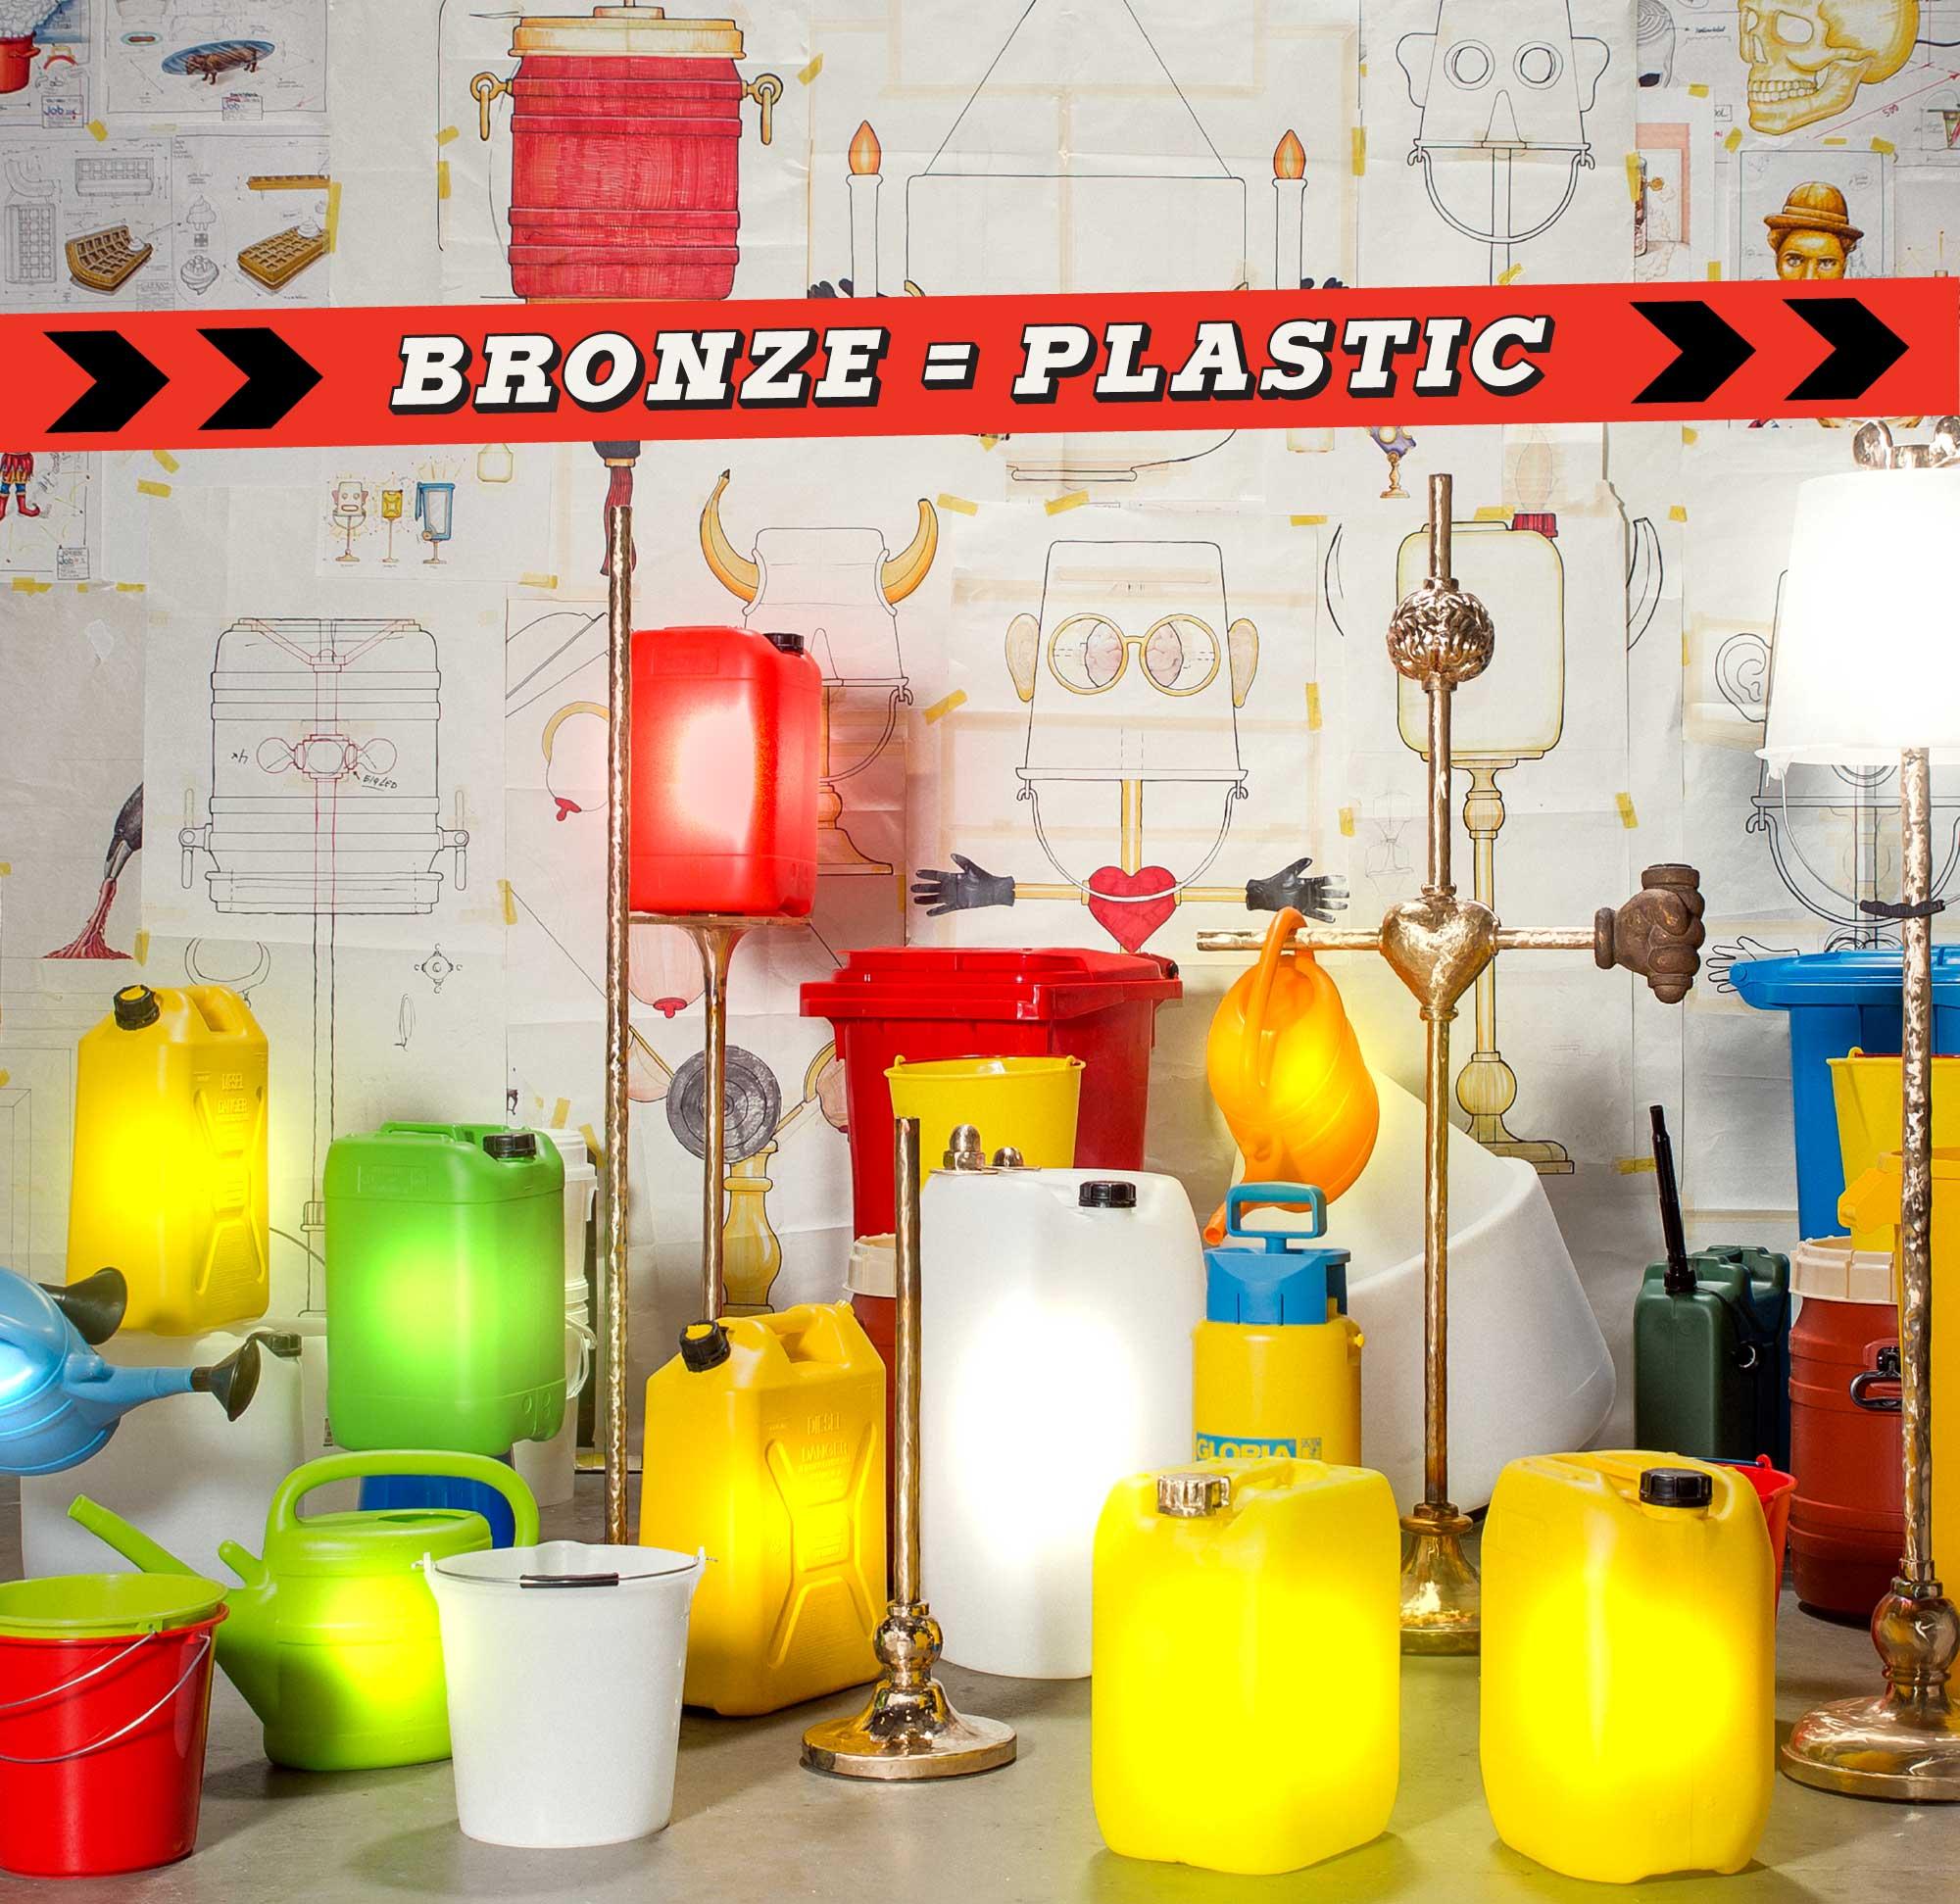 Bronze-Plastic-Milano-2019